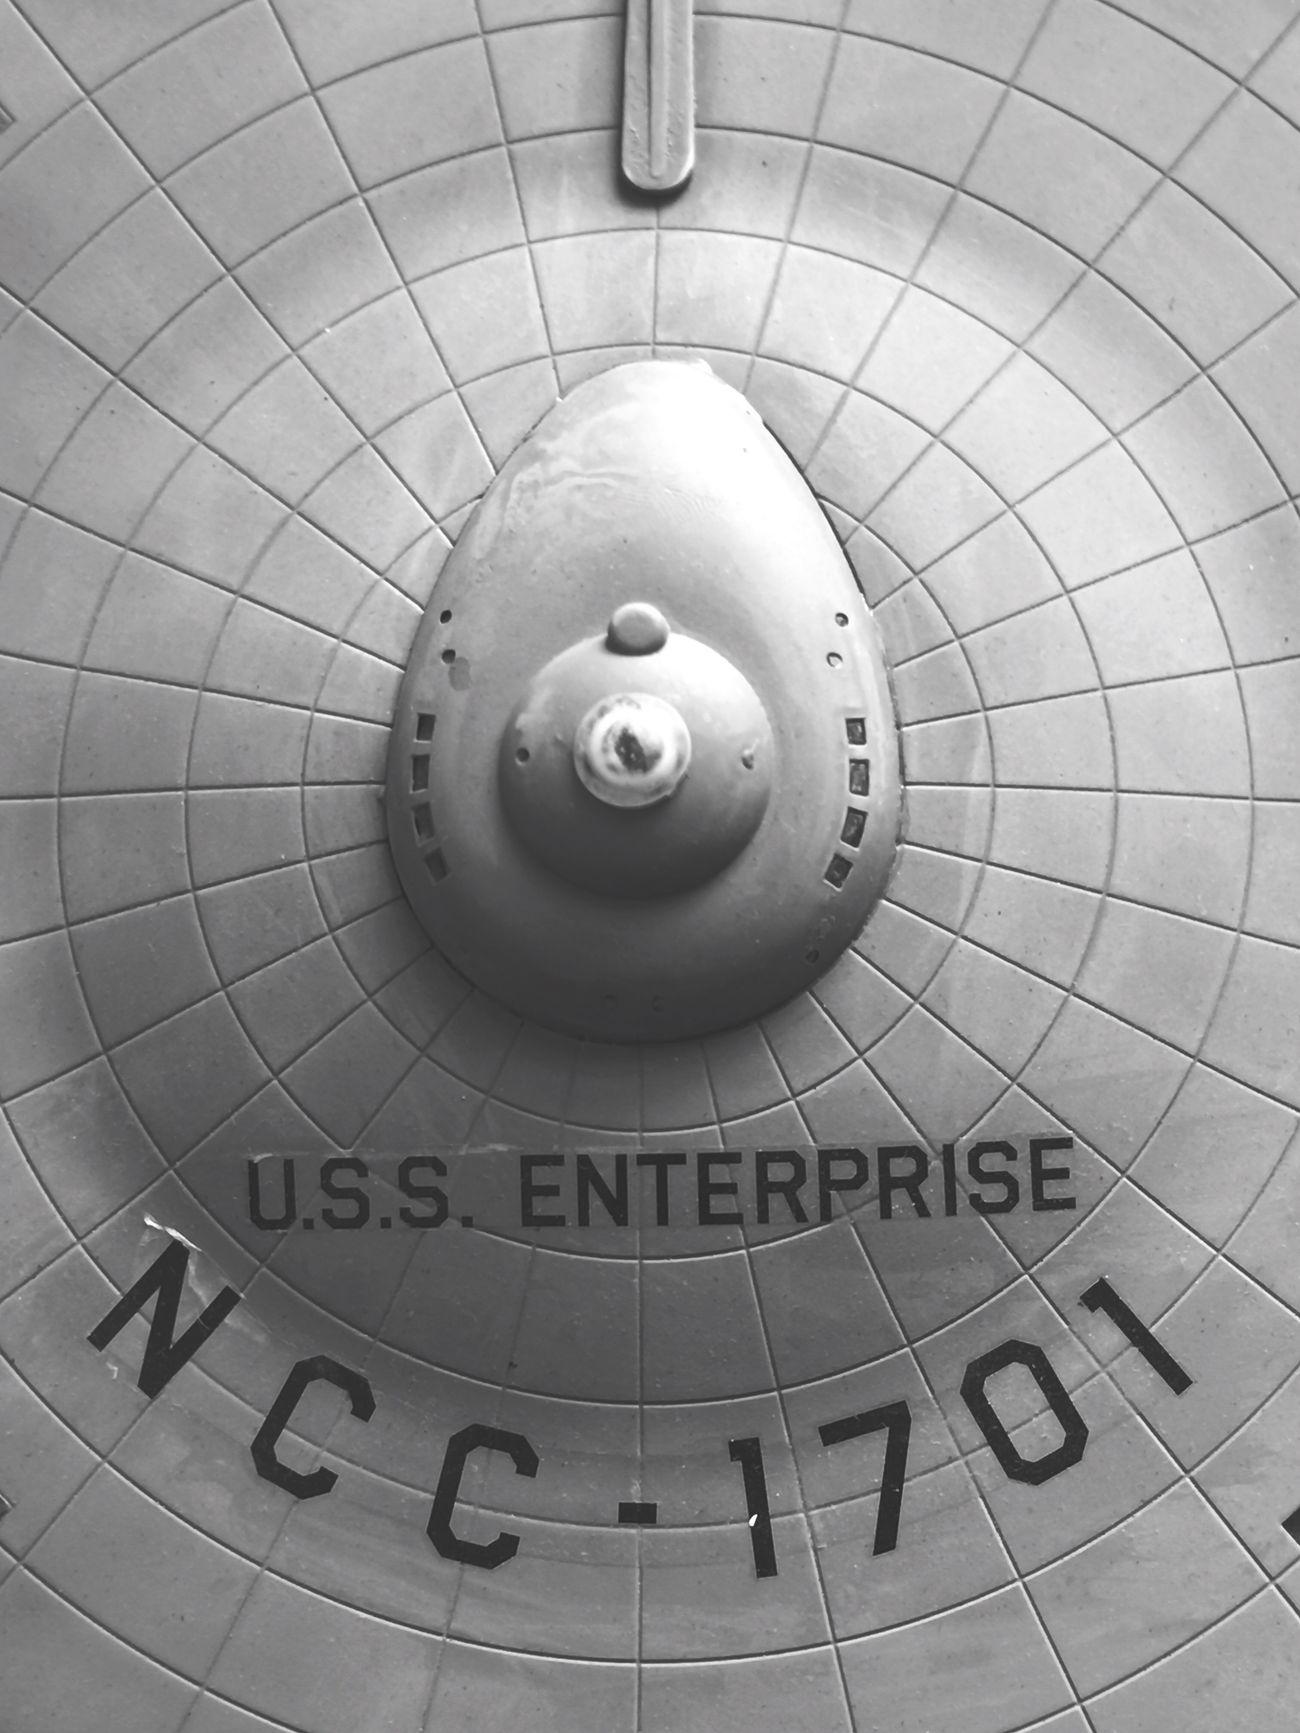 Plastic model, Constitution Class 'USS Enterprise - NCC-1701' Close-up Convenience Geometric Shape Man Made Object No People Startrek History Journey